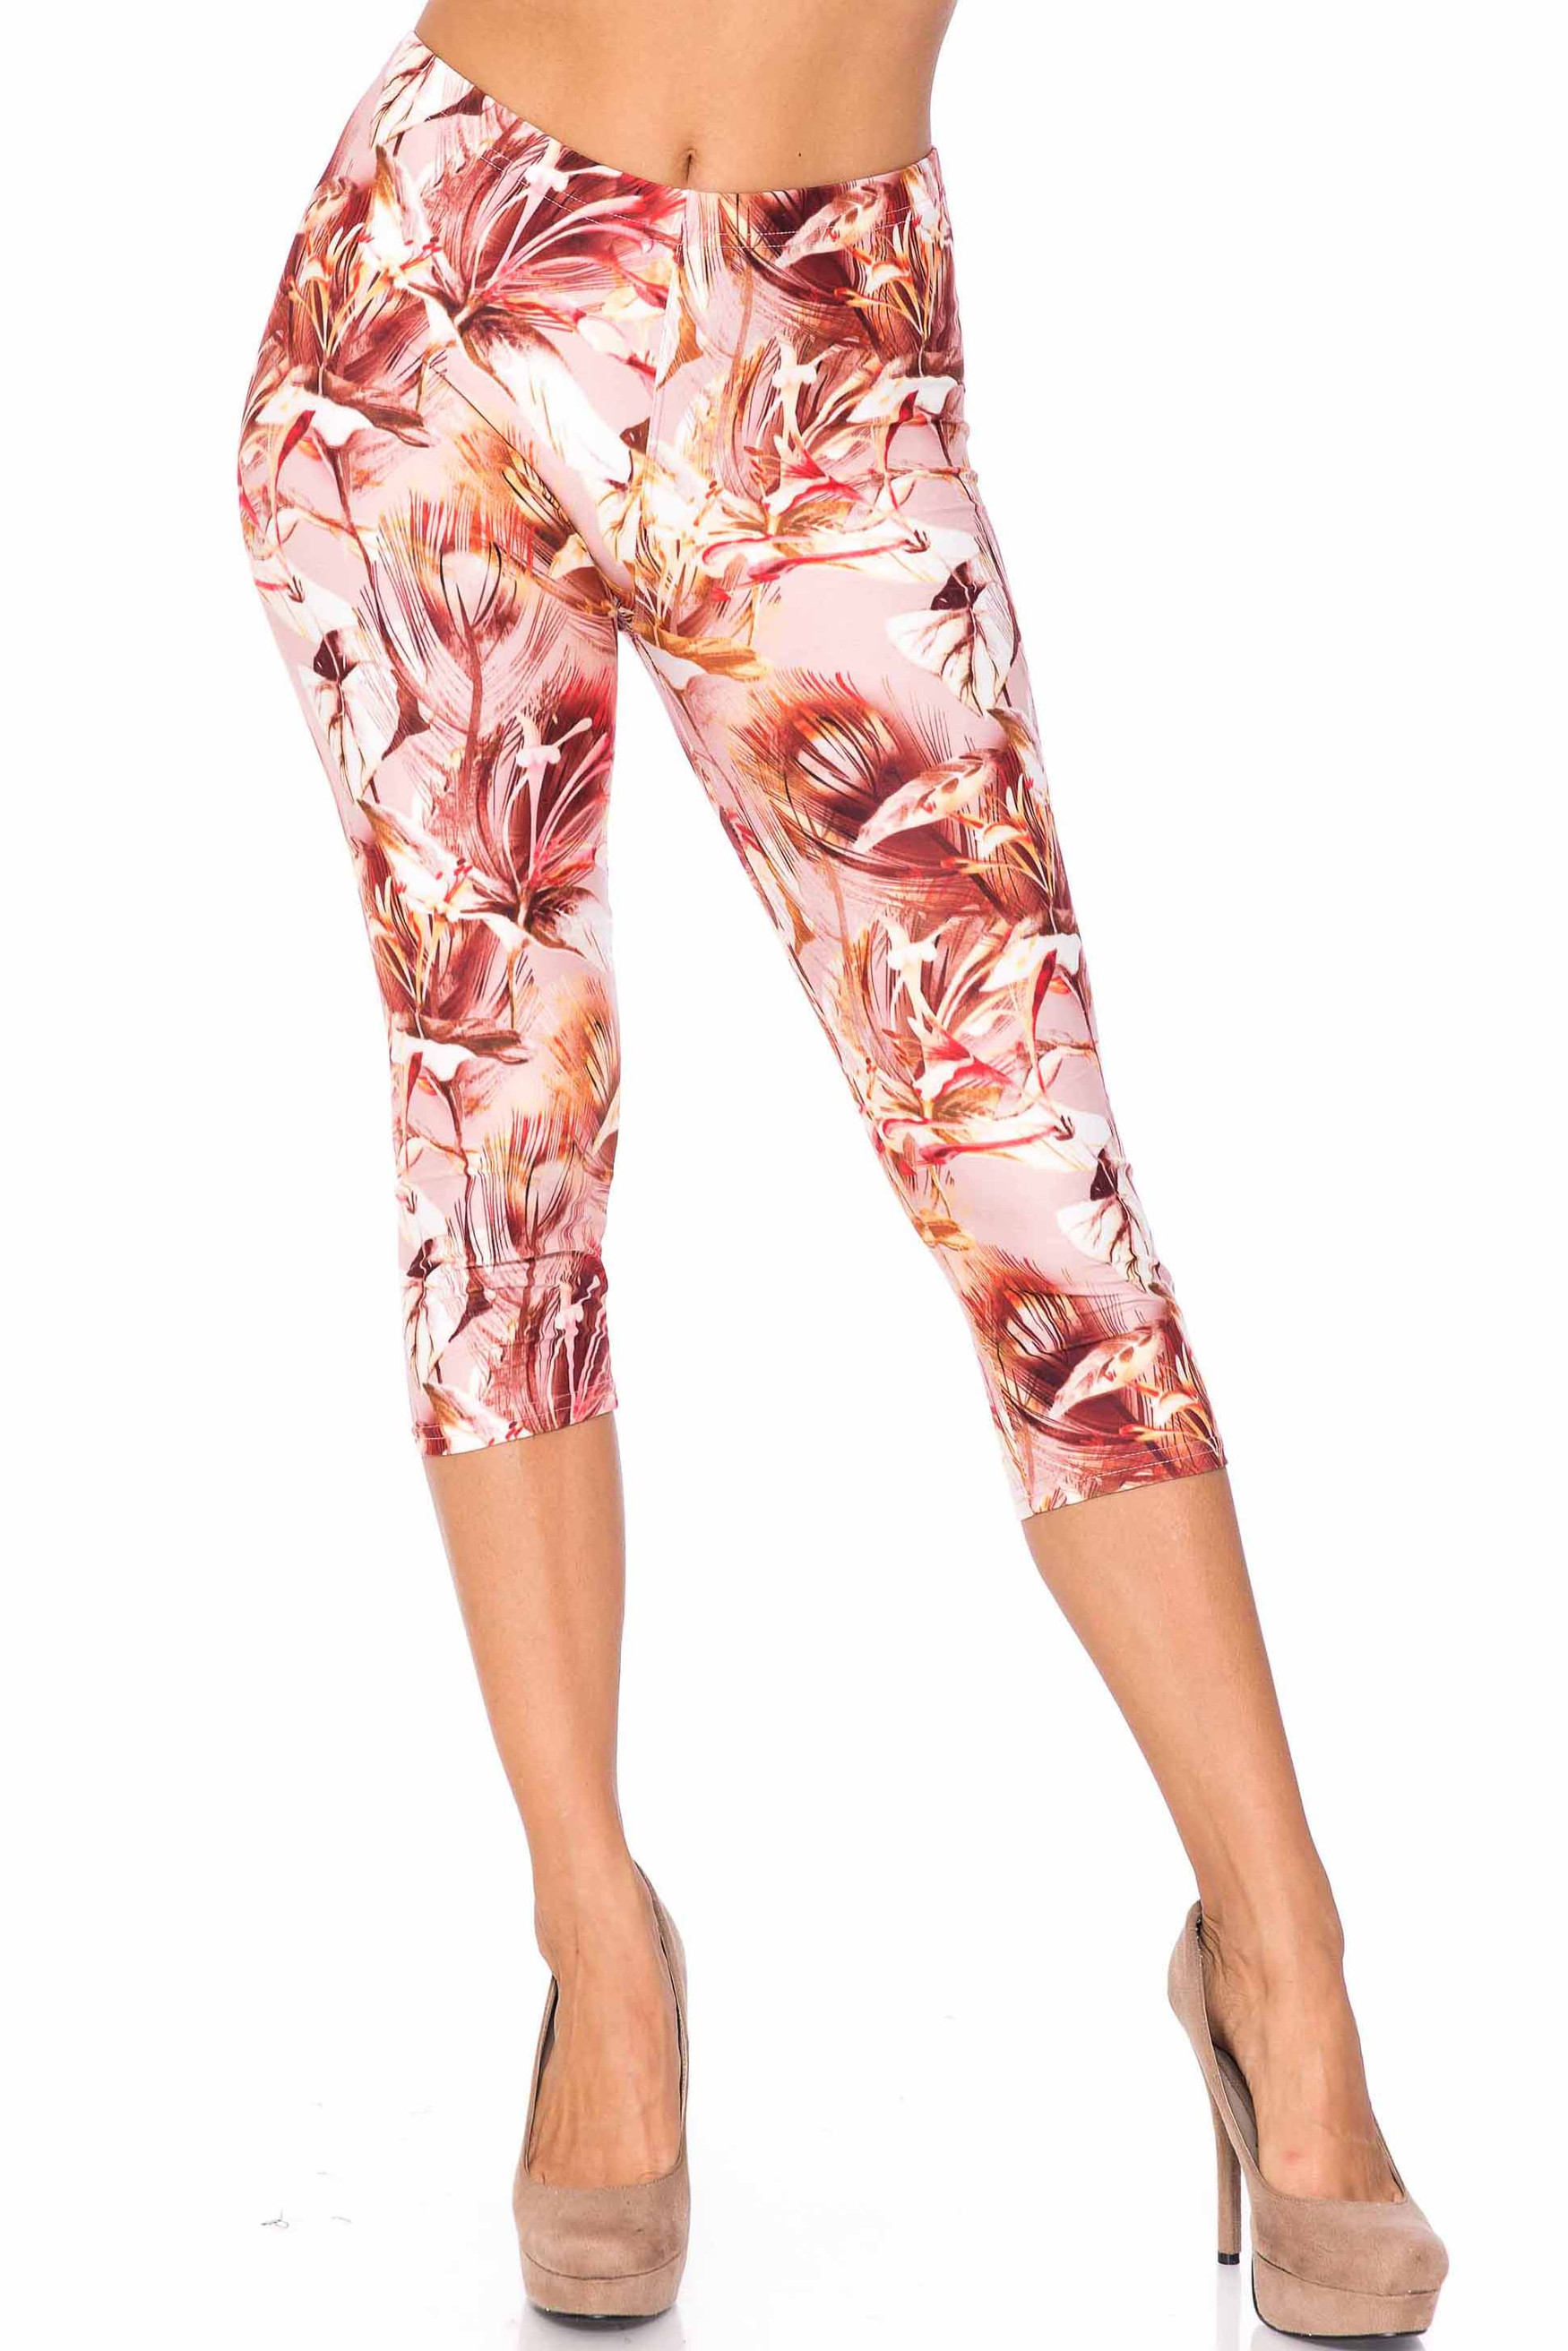 Creamy Soft Mocha Floral Capris - USA Fashion™